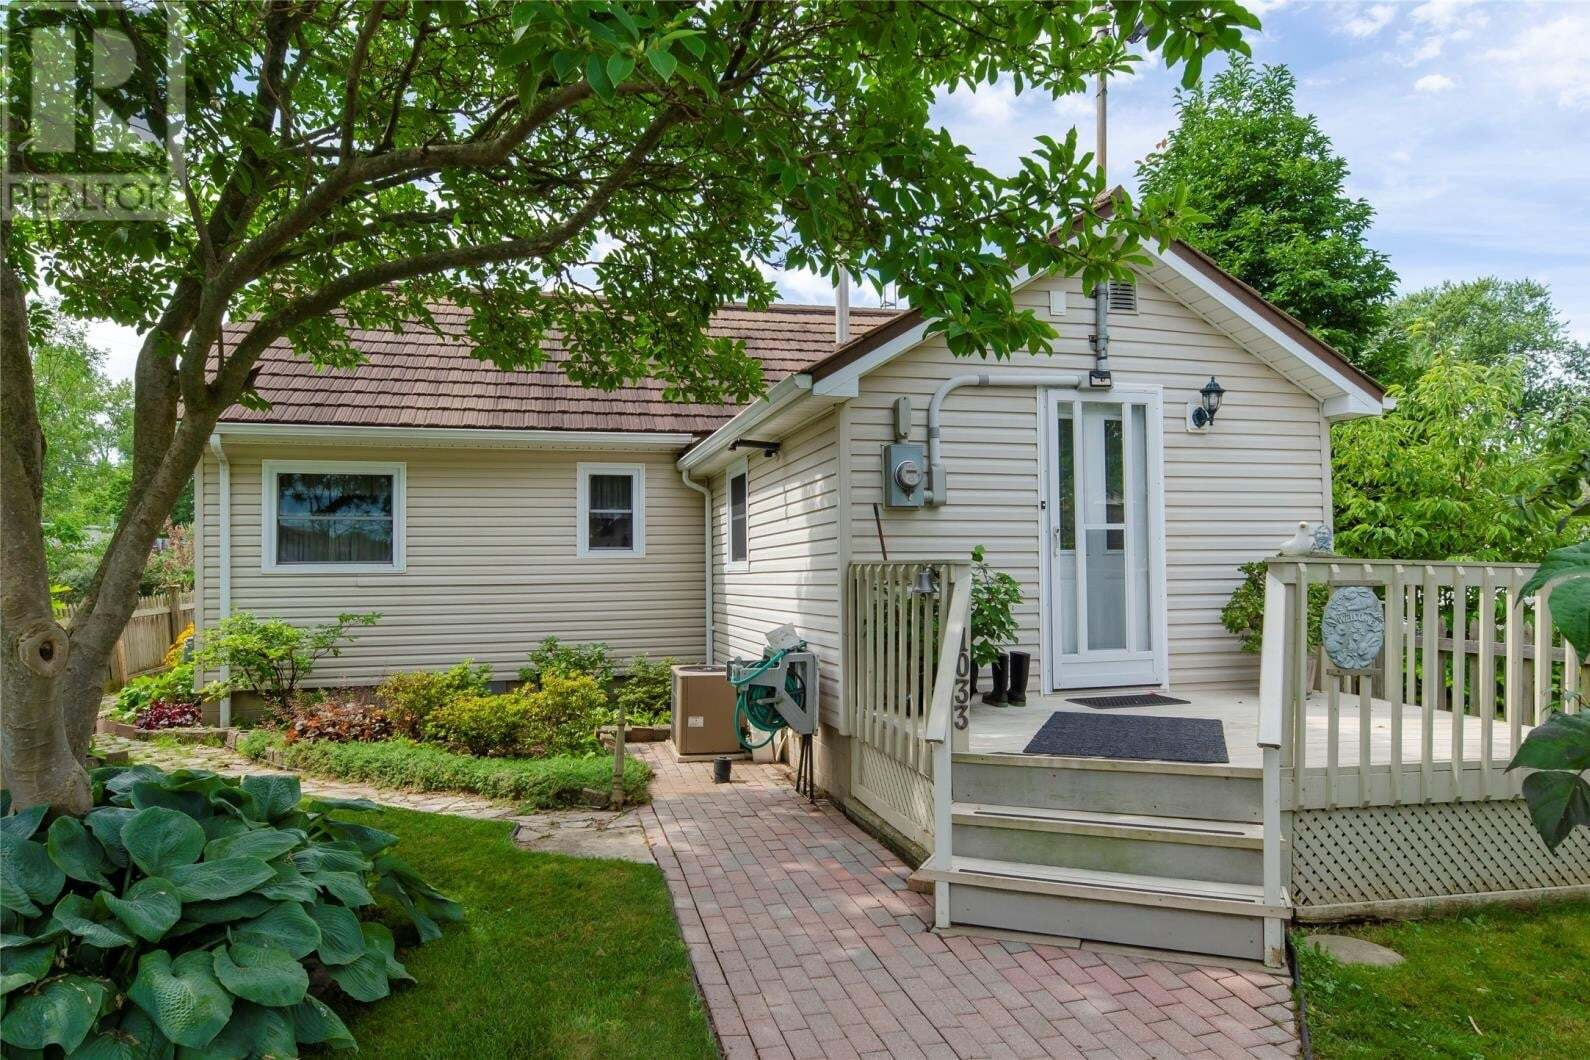 House for sale at 1033 Cedar  Kingsville Ontario - MLS: 20008925